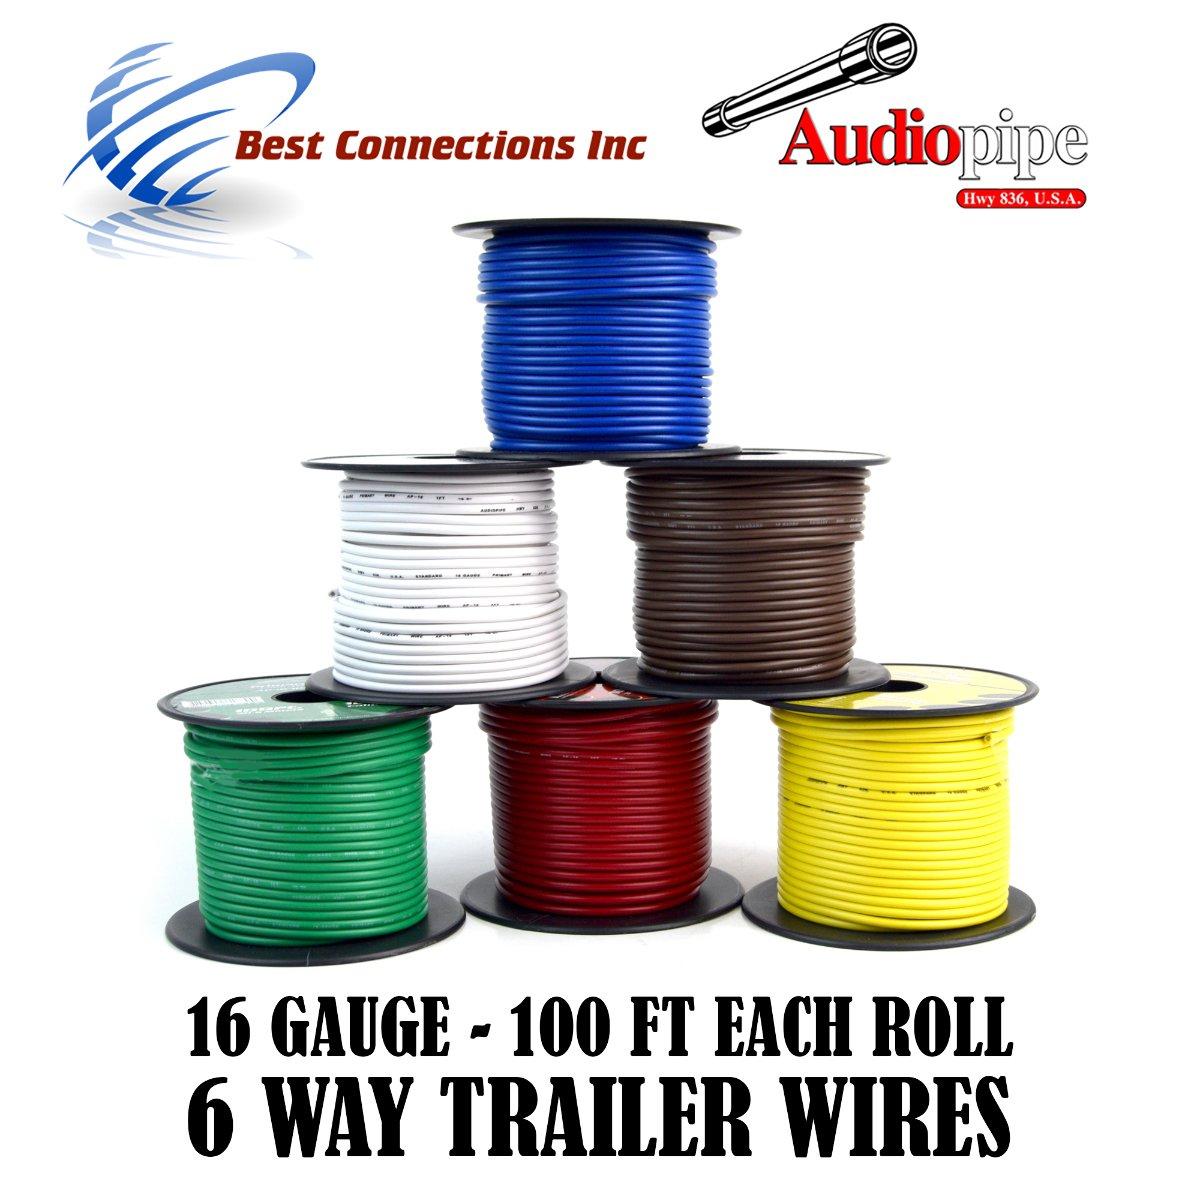 6 way trailer wiring harness 100 feet wiring diagram g8  6 way trailer wiring harness 100 feet #10